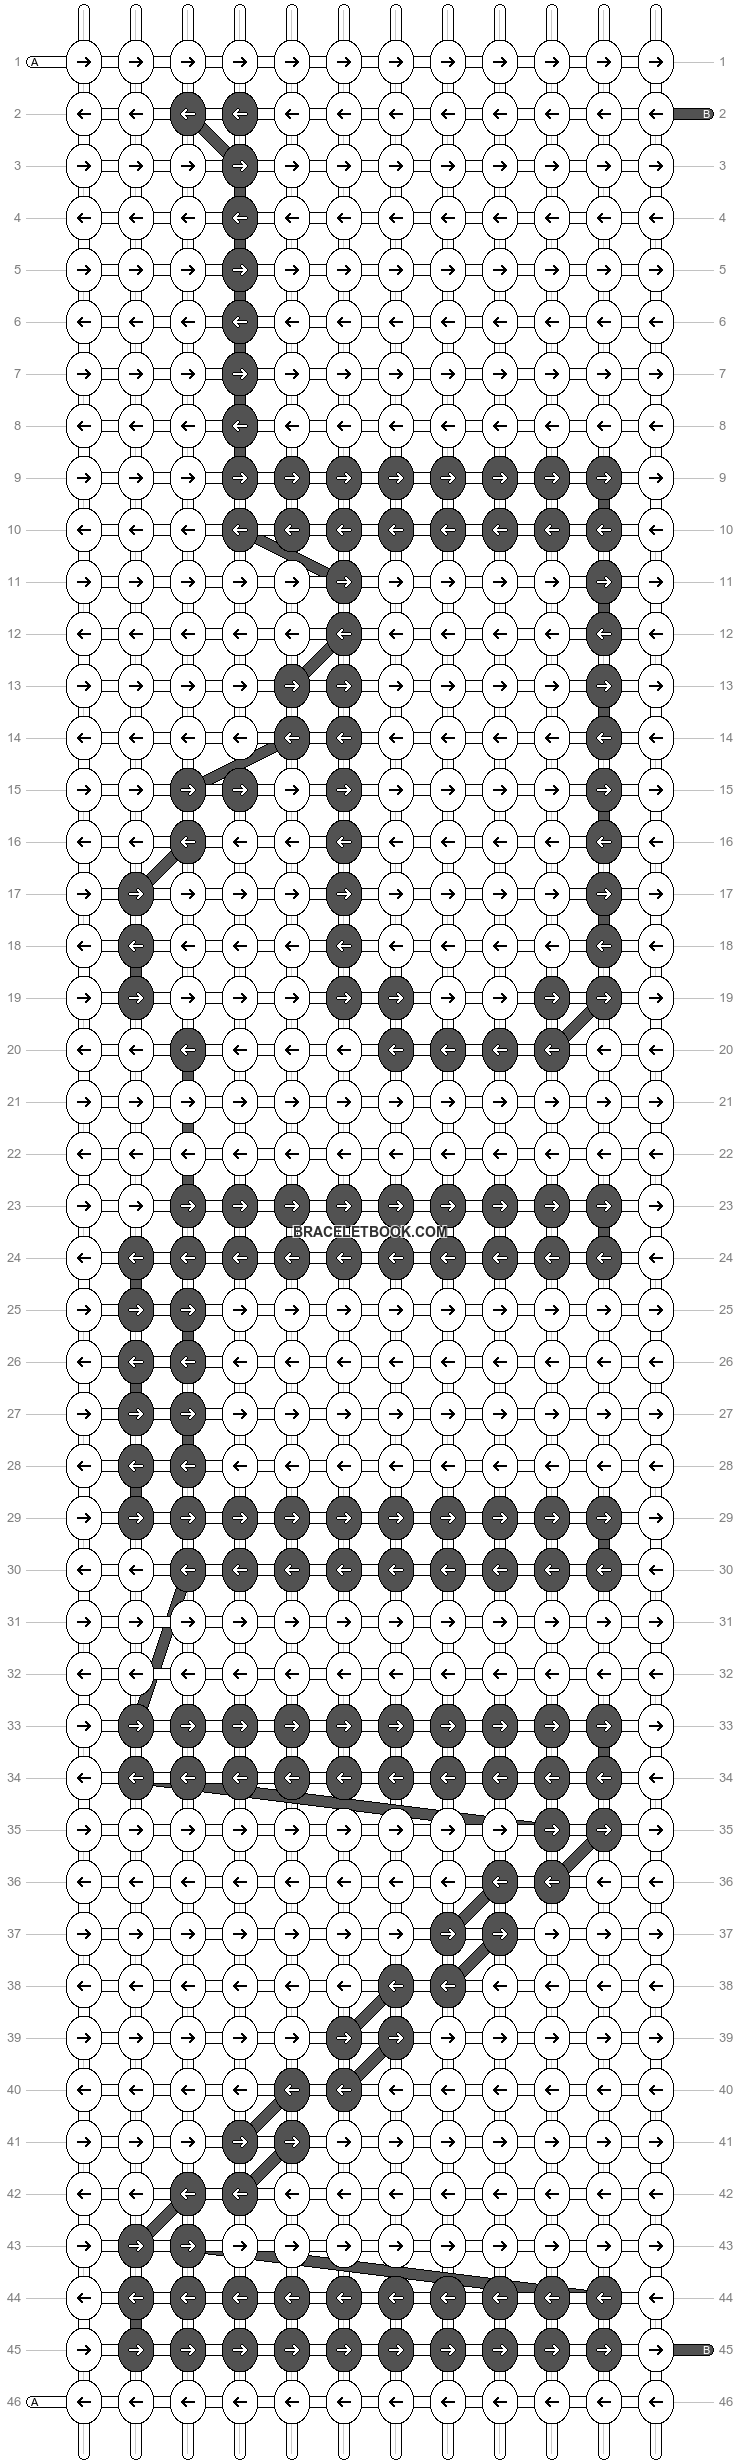 Alpha pattern #22493 pattern